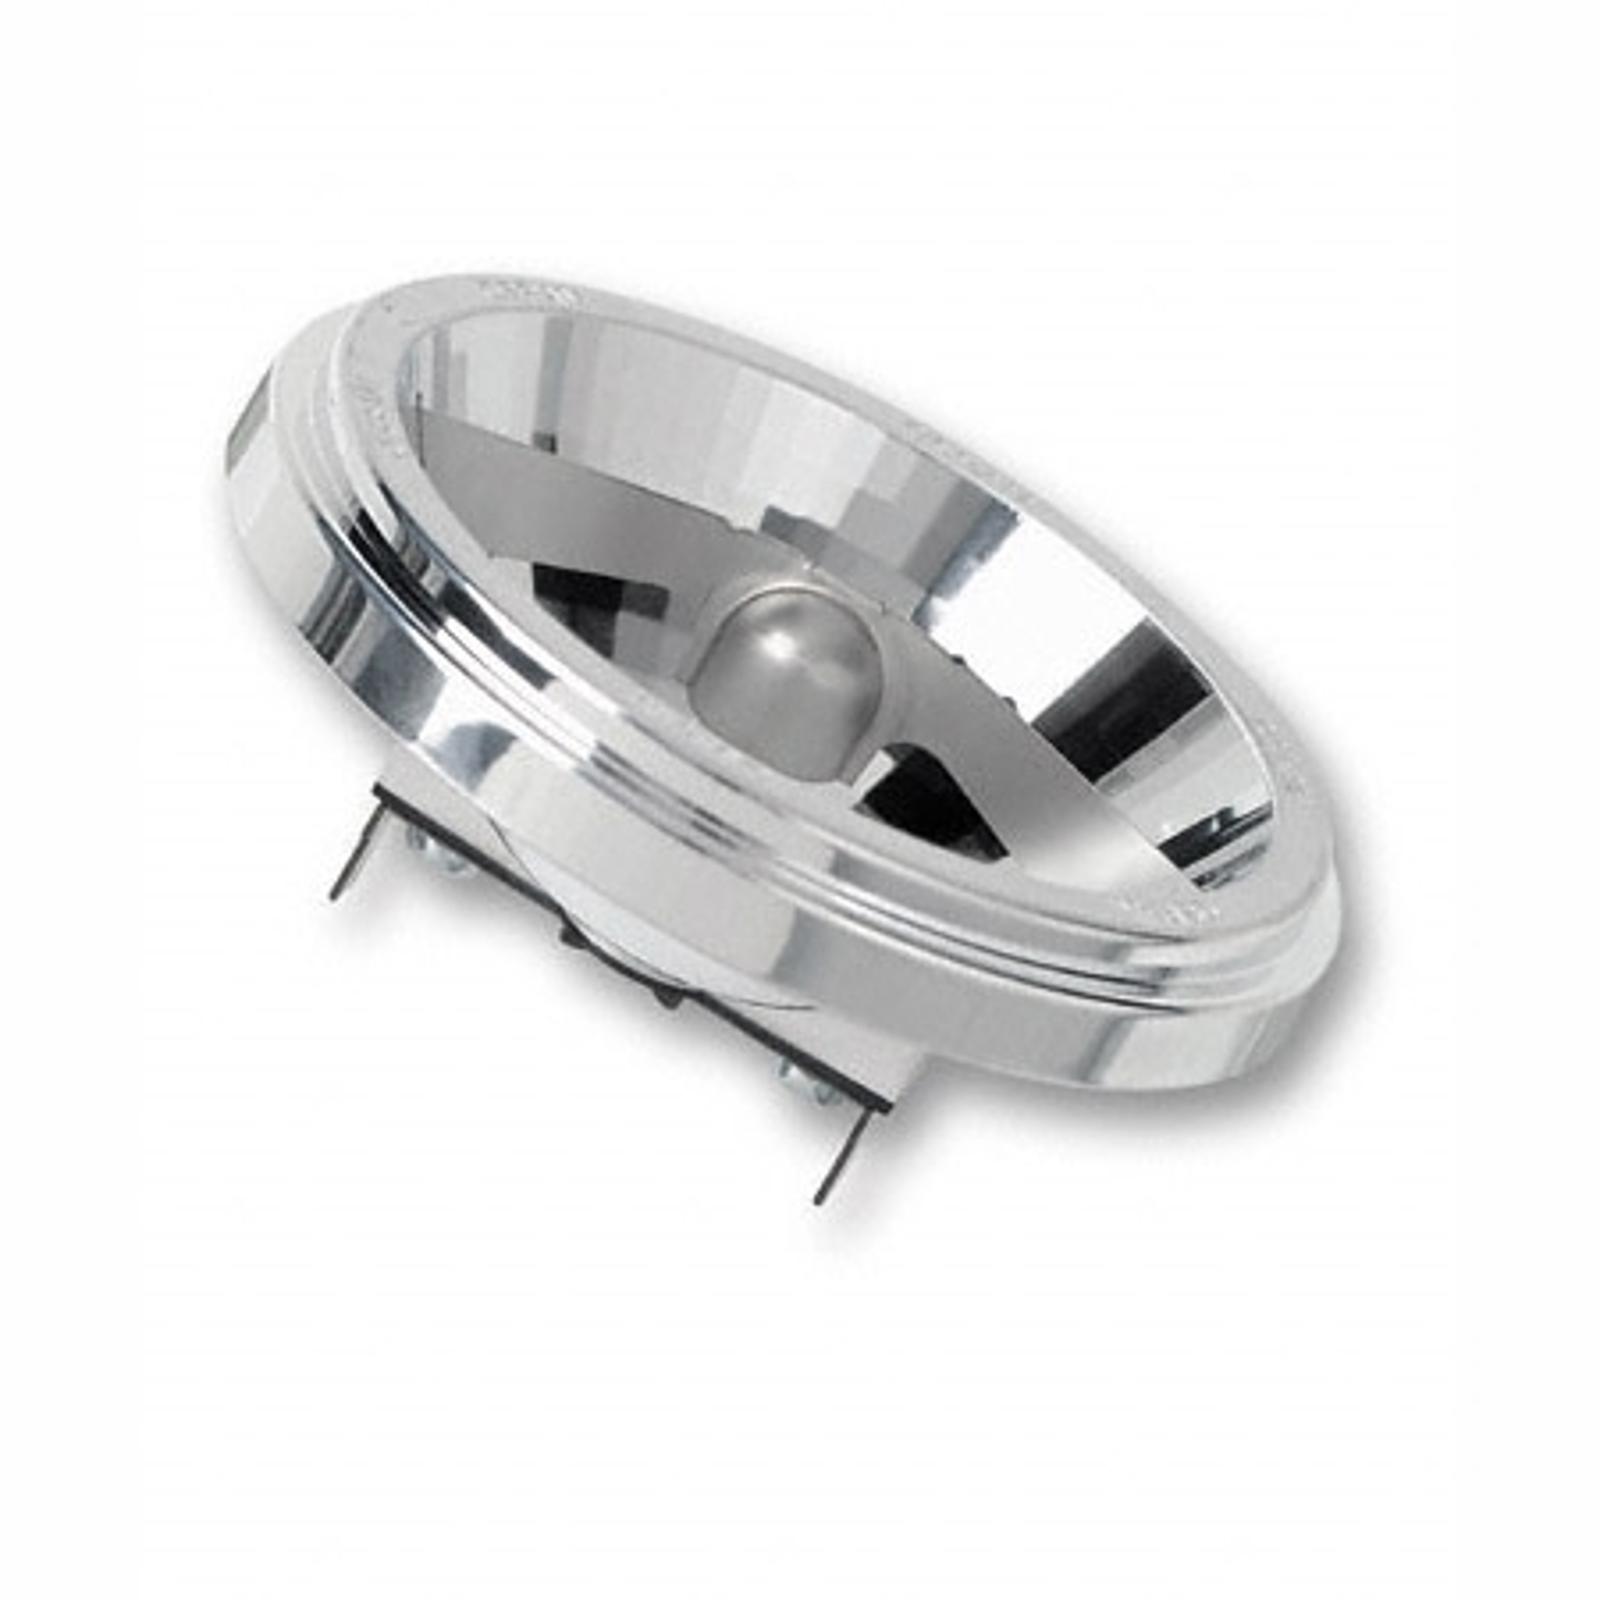 G53 60W 6° Reflektorlampe HALOSPOT 111